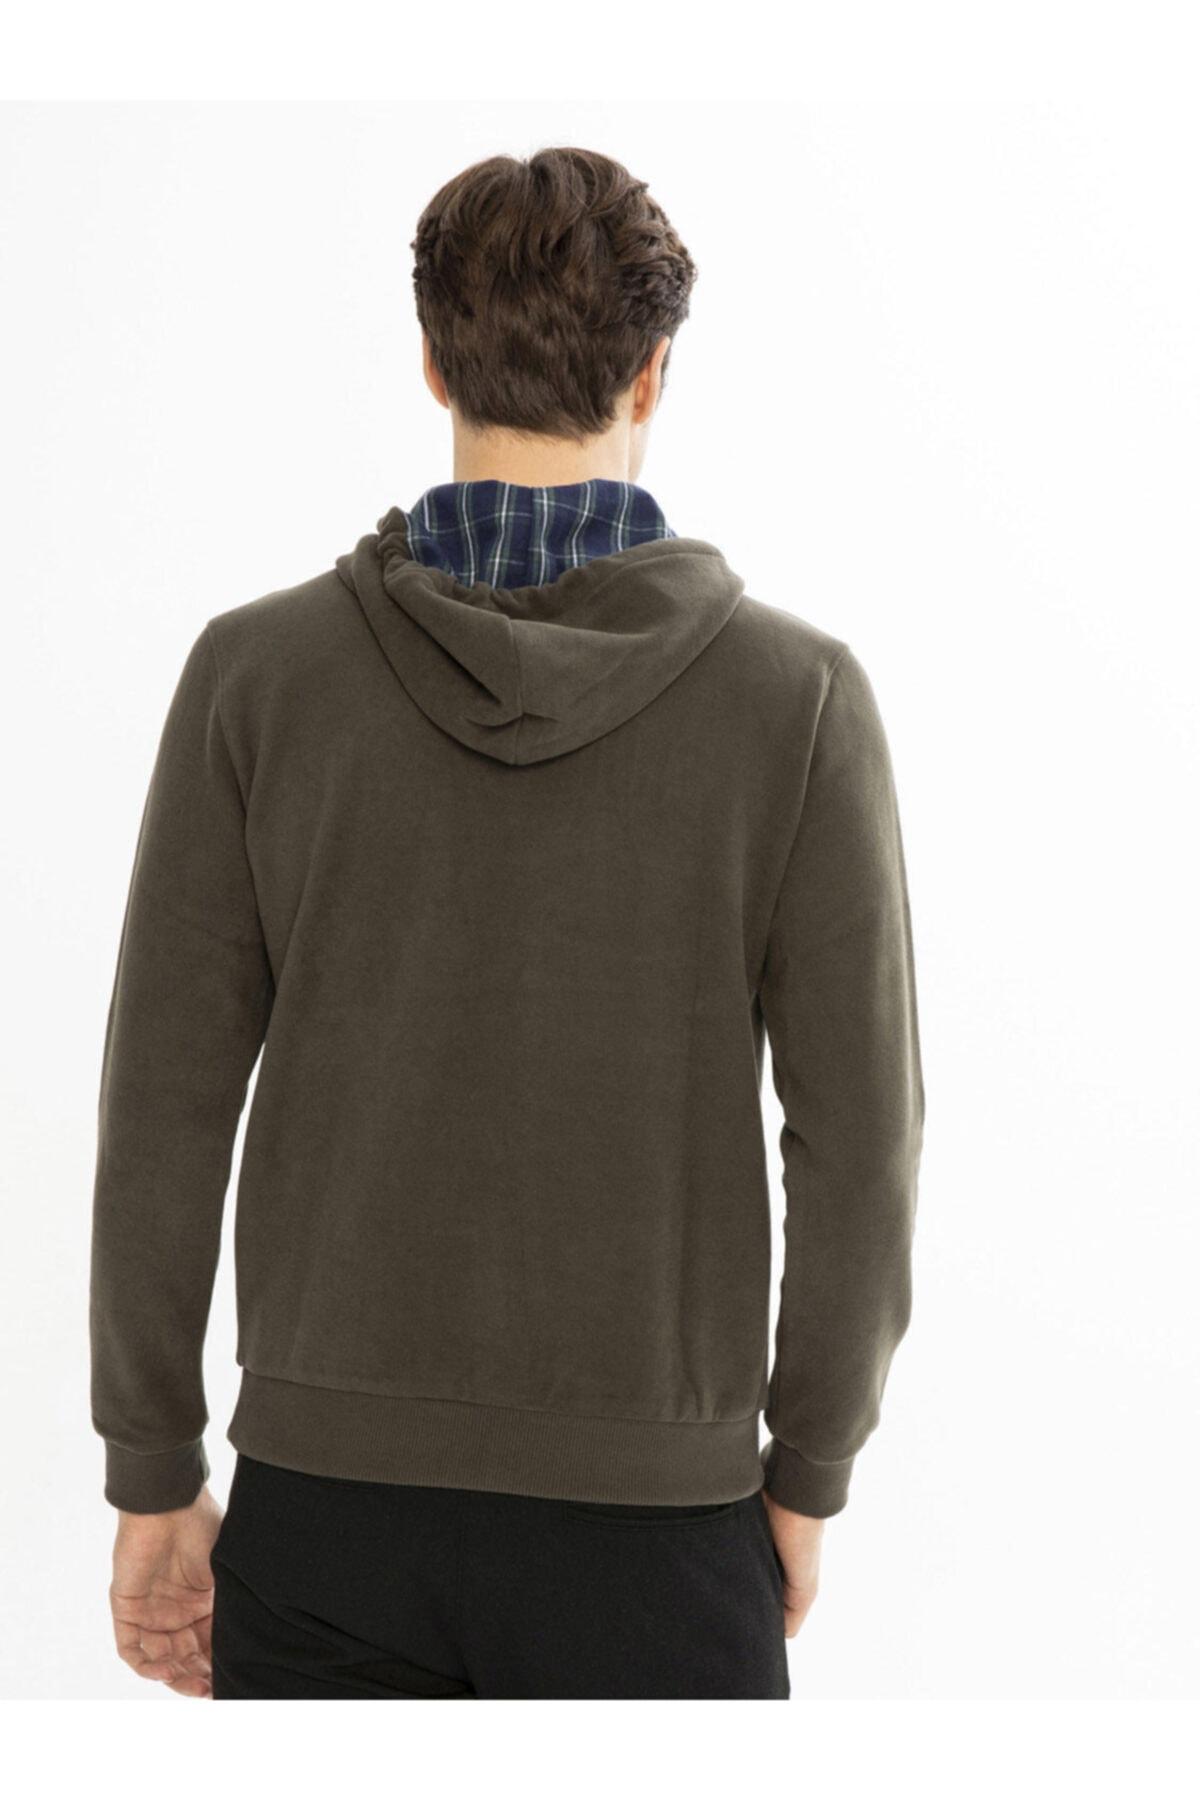 Mcl Giyim Kapüşonlu Baskılı Pamuklu Sweatshirt